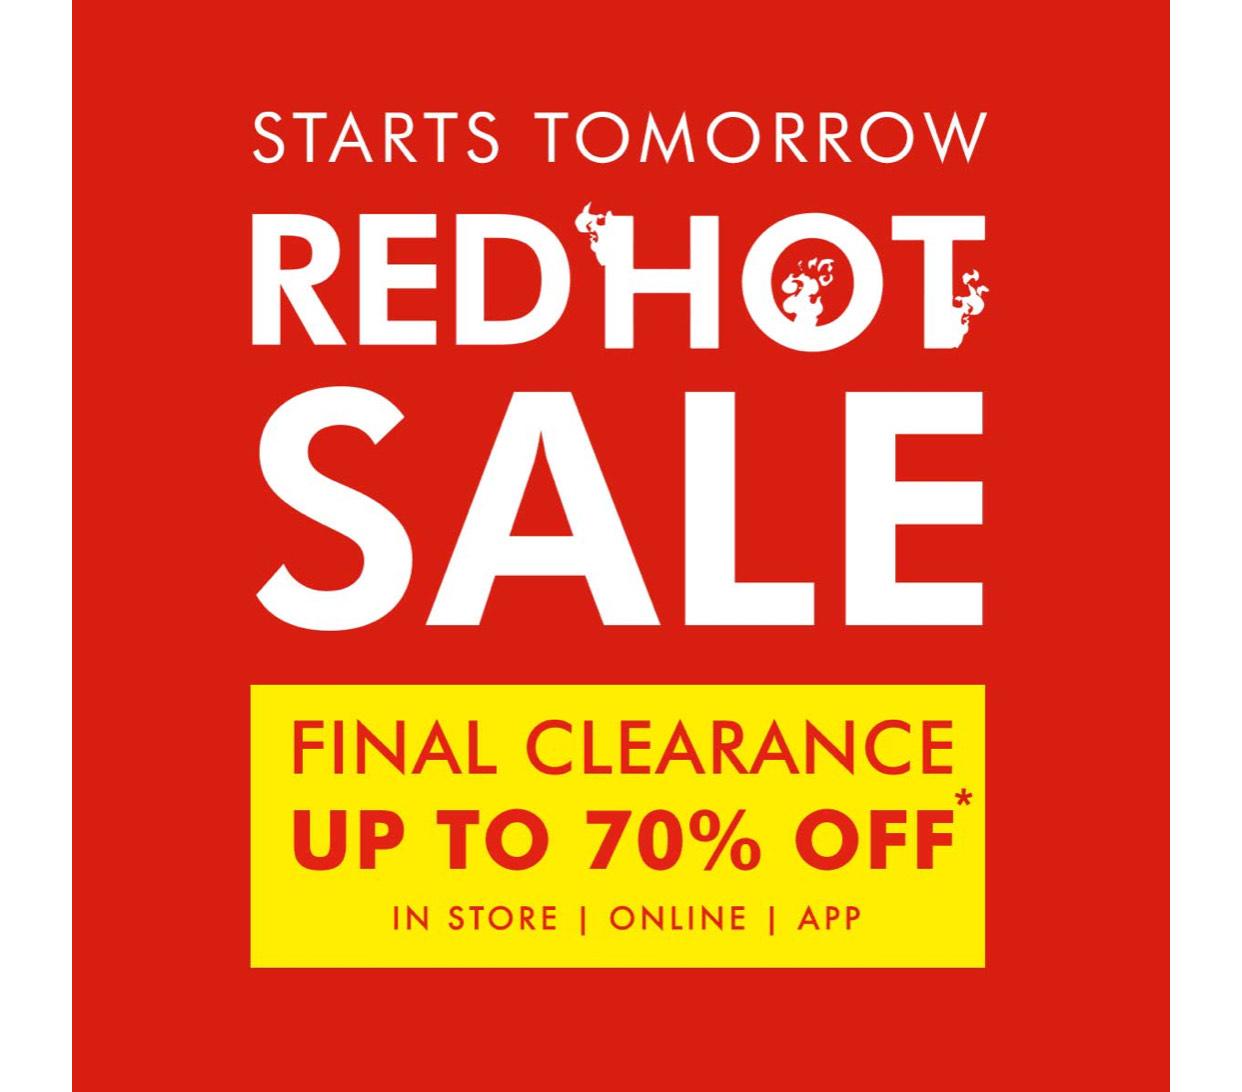 Upto 70% off sale + Free Click & Collect at Matalan